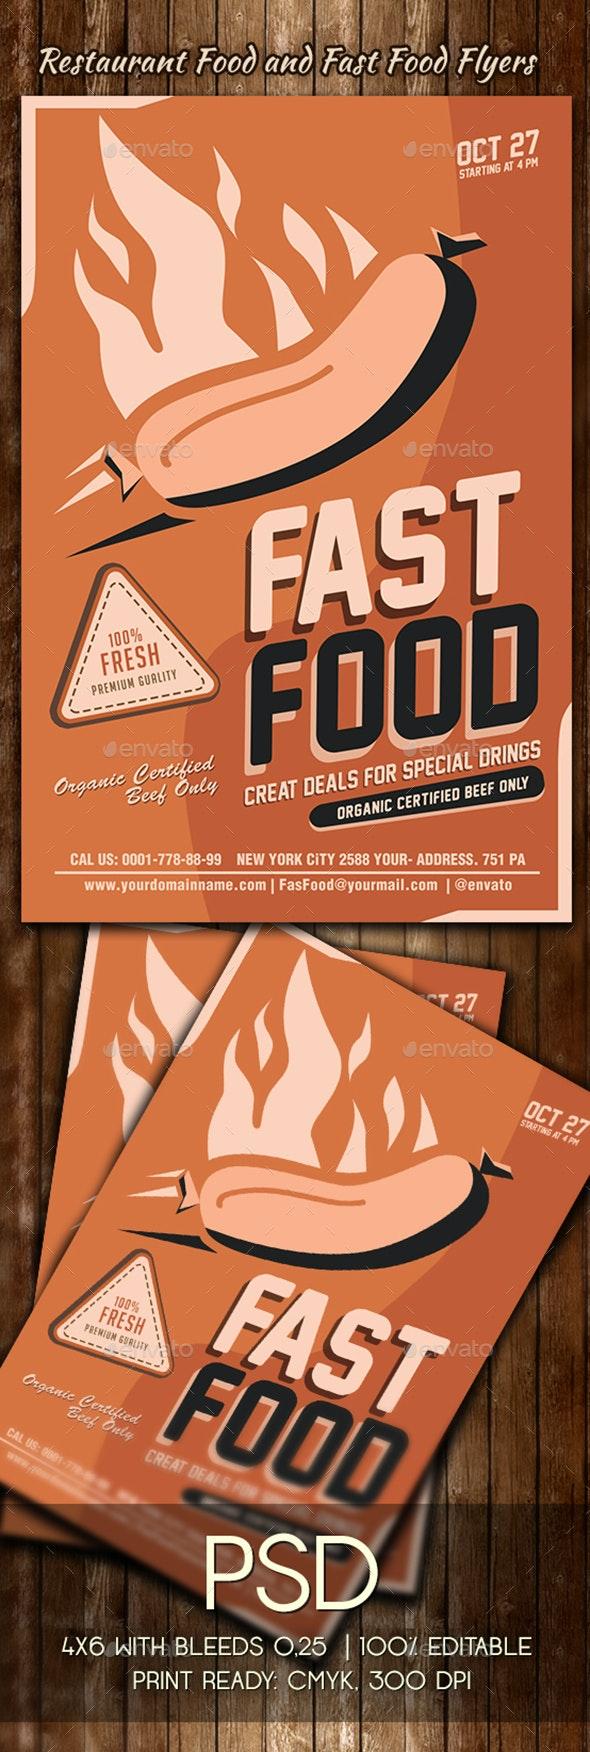 Fast Food Flyer Template - Restaurant Flyers